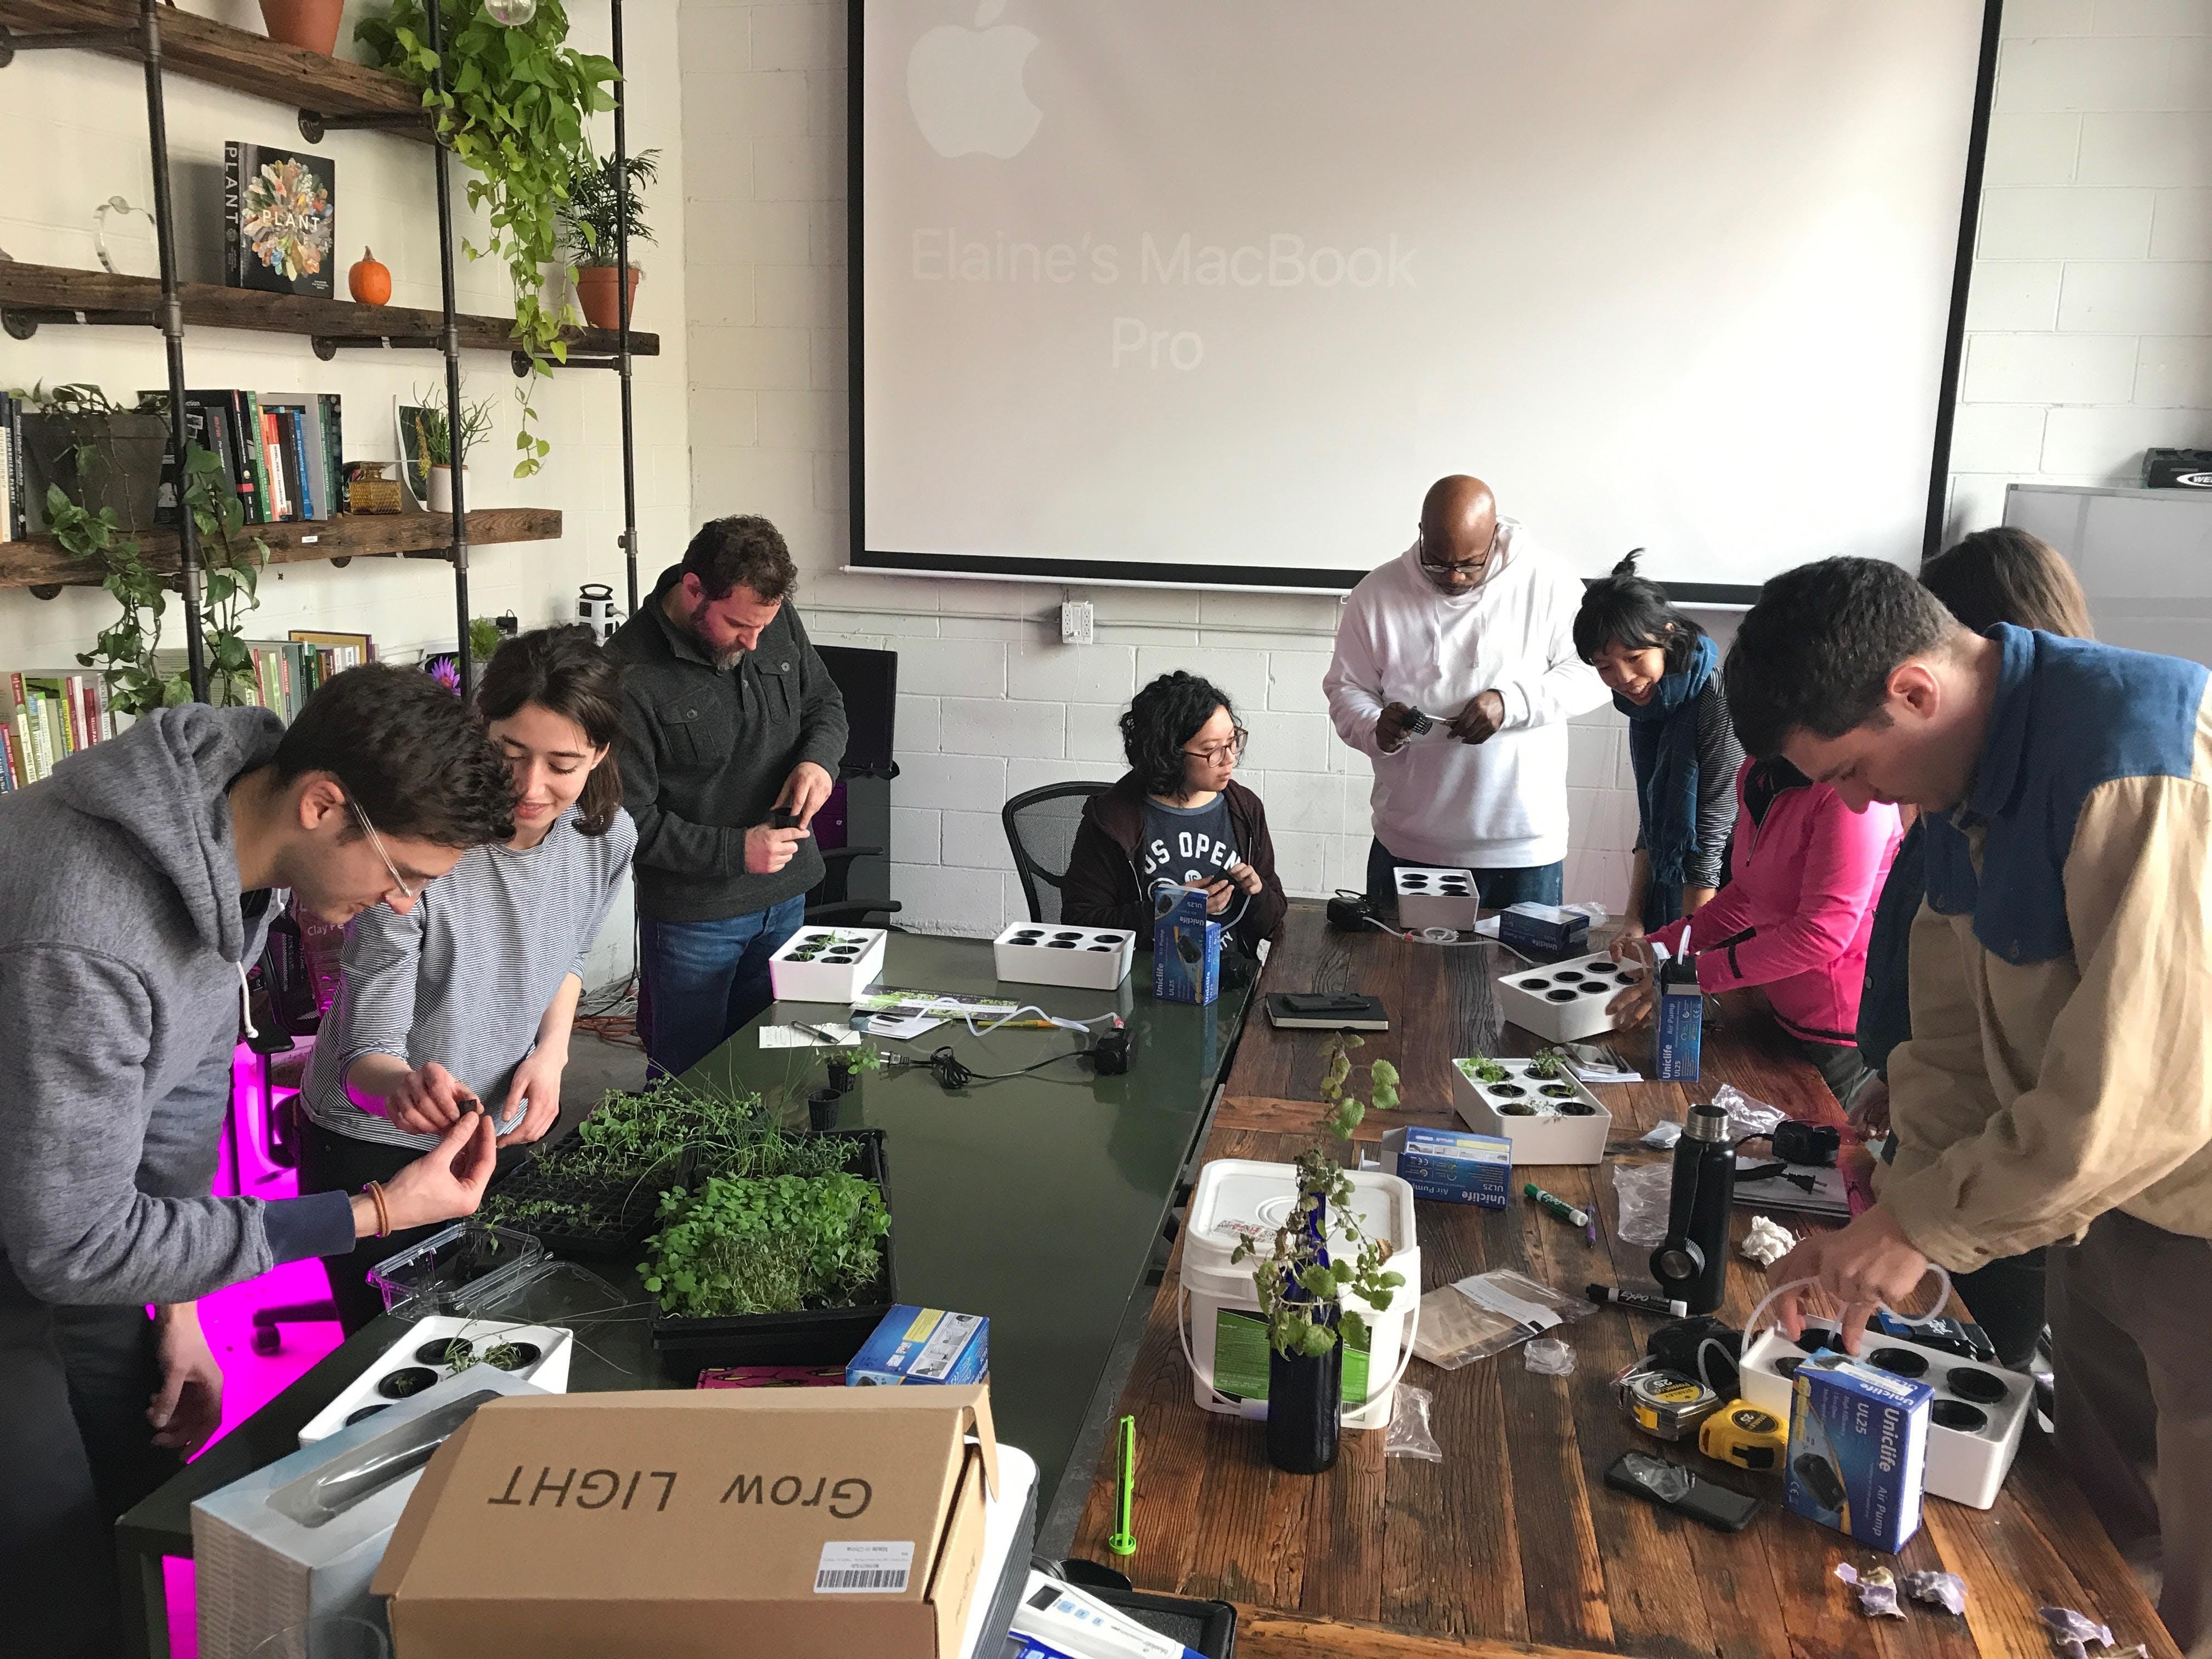 Farm Workshop Build Your Own Mini Hydroponic System